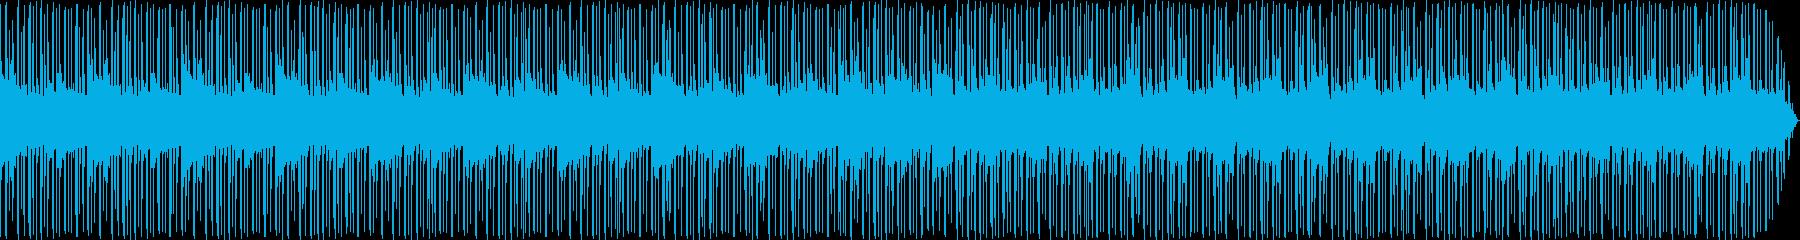 Jazz/NeoSoul系の生楽器BGMの再生済みの波形